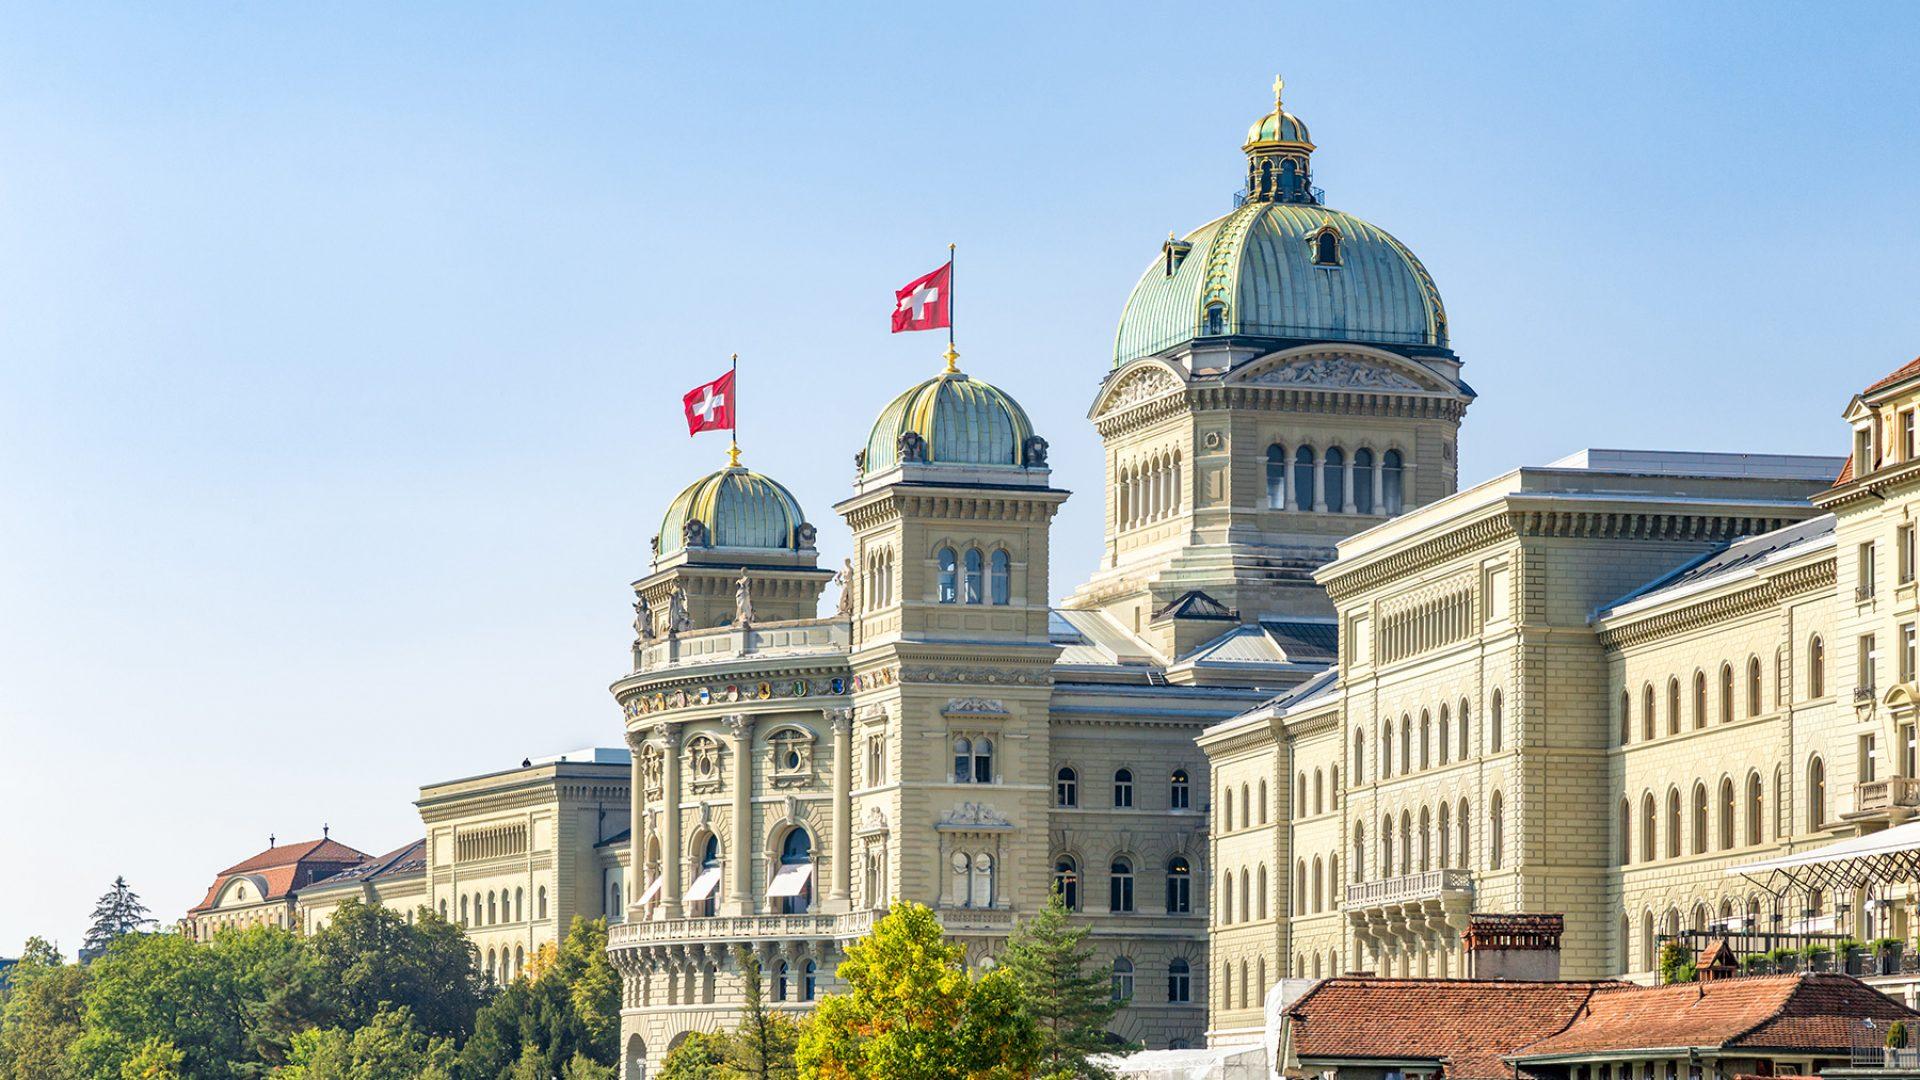 Swiss society and history